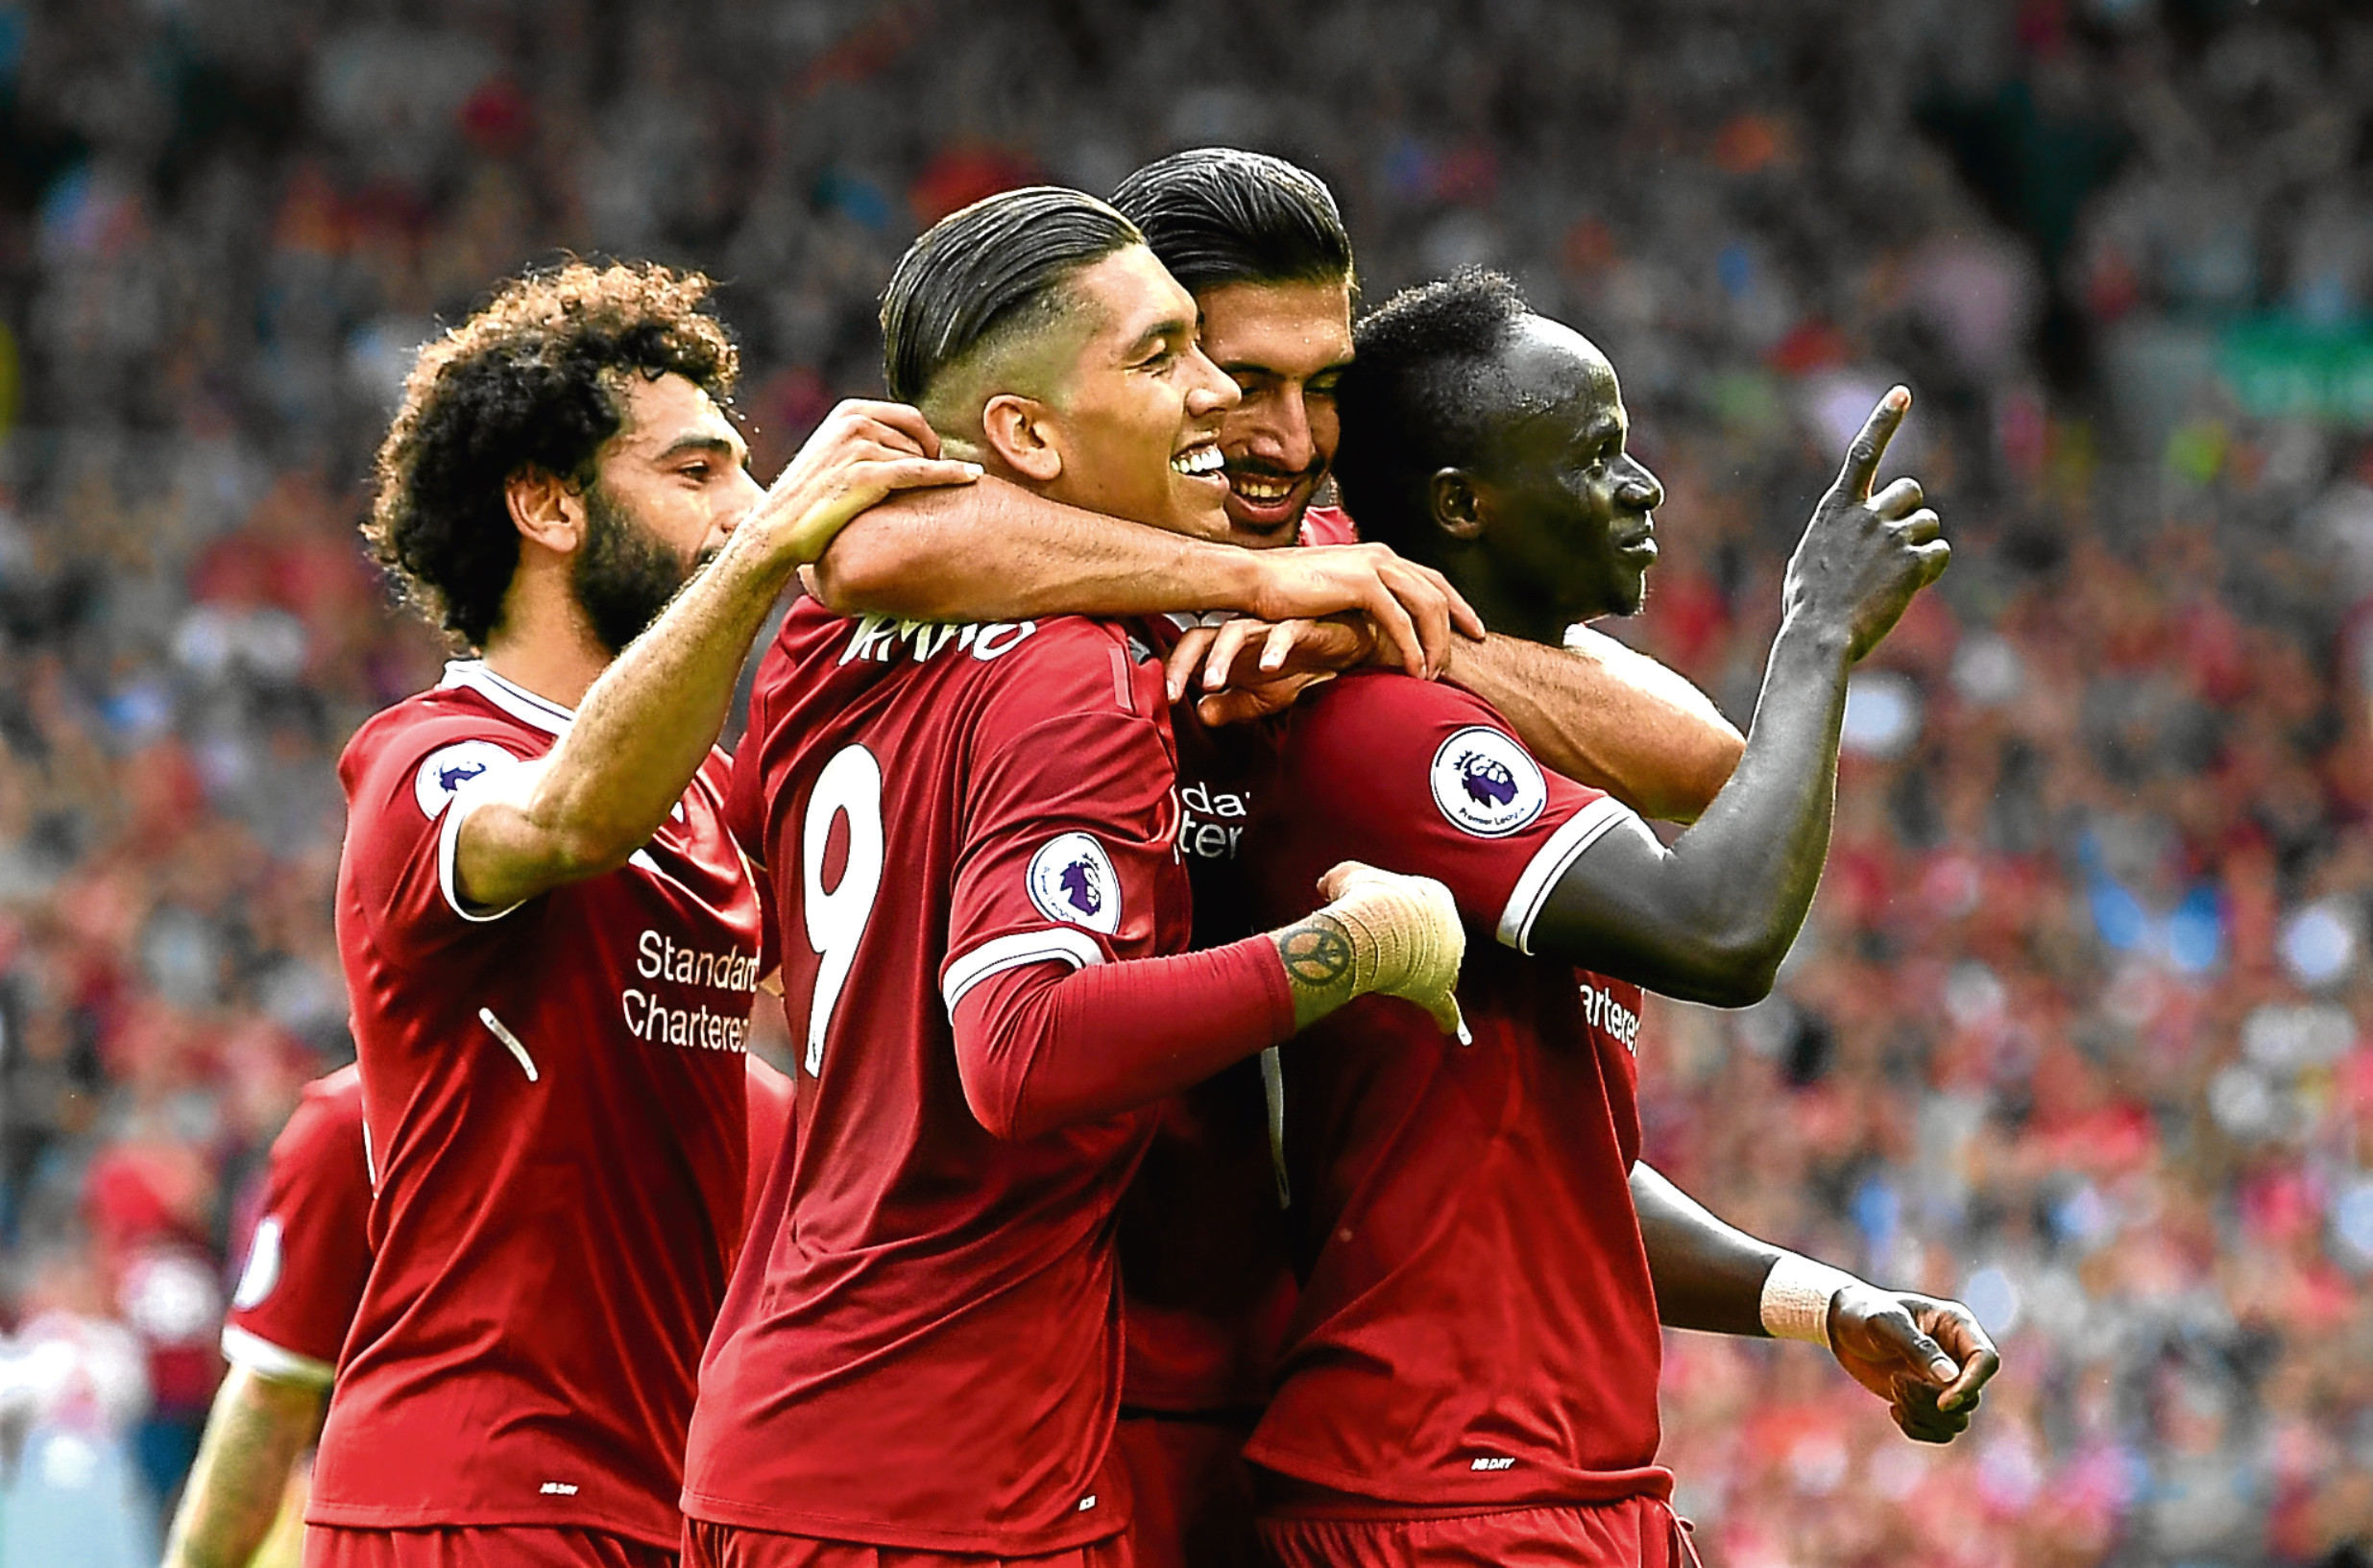 Sadio Mane of Liverpool celebrates scoring (Michael Regan/Getty Images)